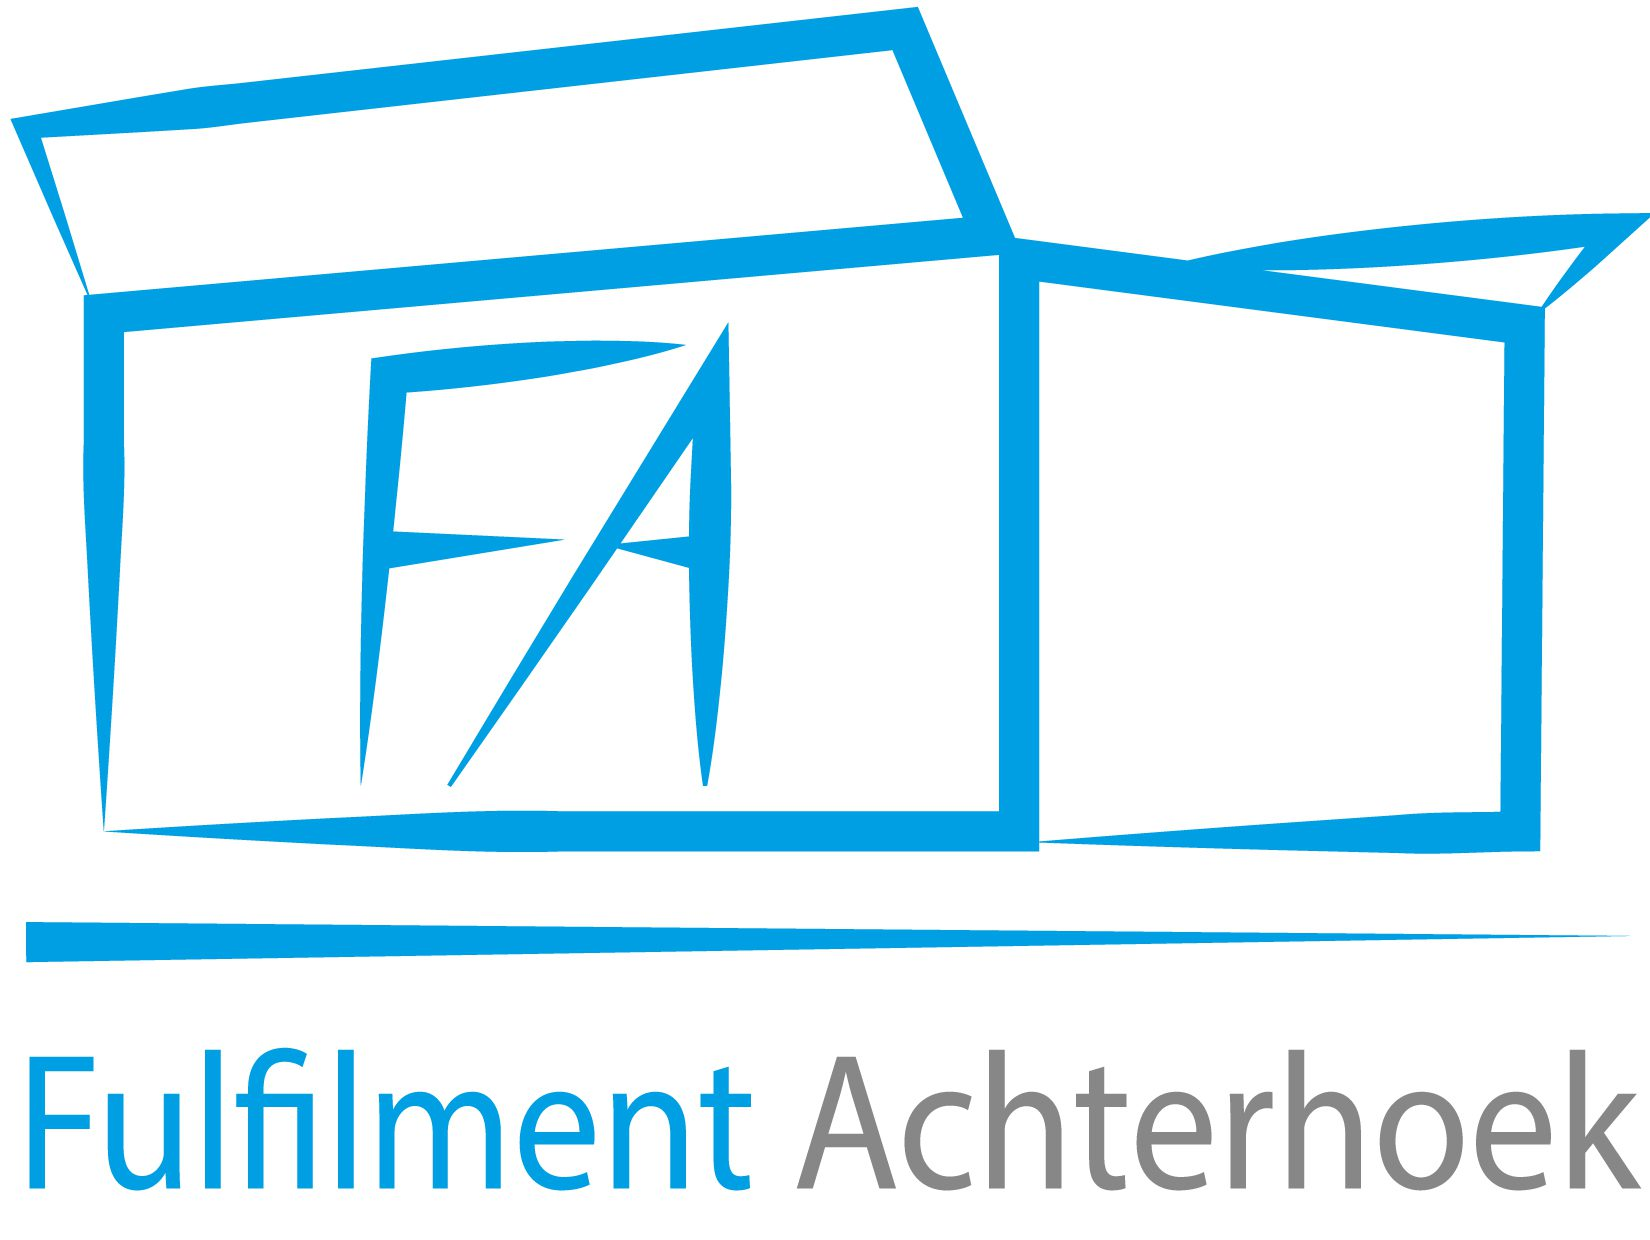 FULFILMENT ACHTERHOEK